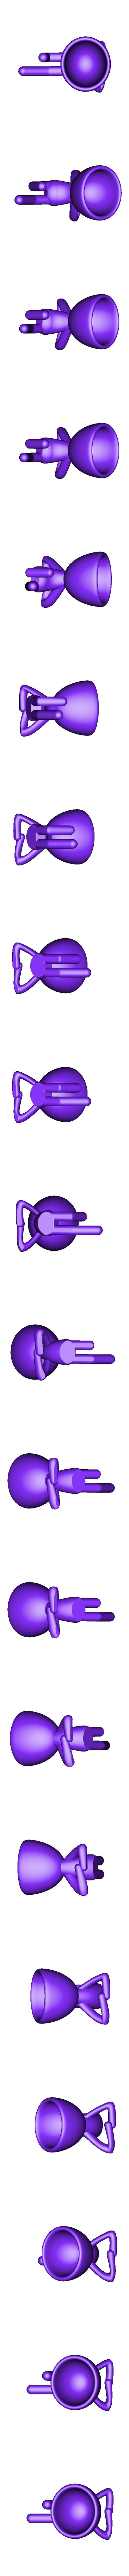 Vaso_2.stl Download free STL file JARRÓN MACETA ROBERT 02 - VASE FLOWERPOT ROBERT 02 • 3D print model, PRODUSTL56